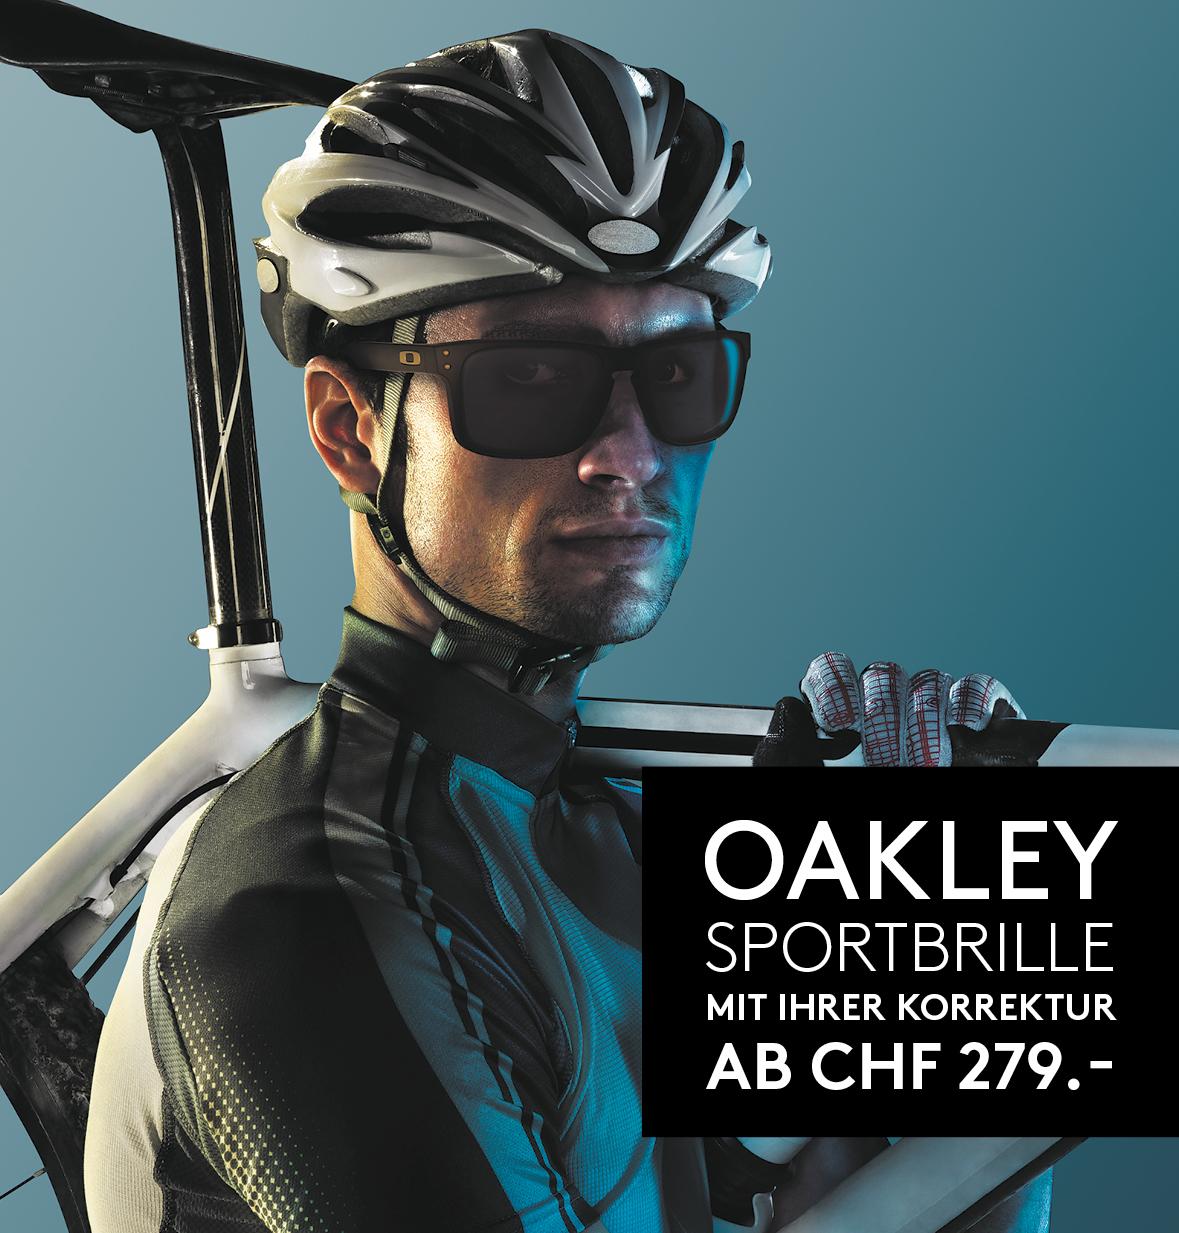 Optic2000-sport-angebot